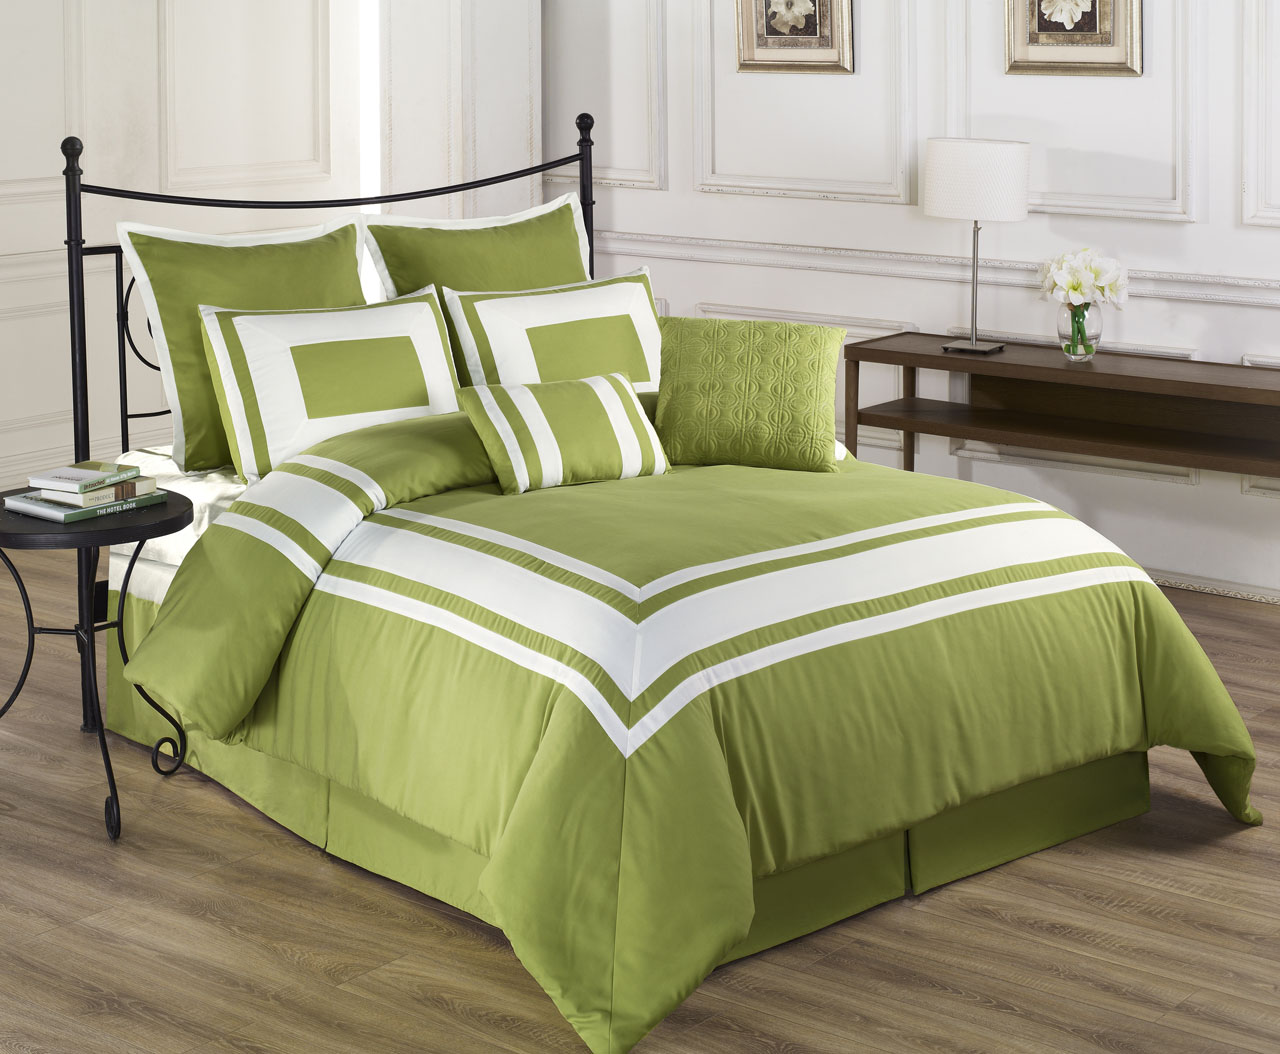 8 Piece Lux Decor Comforter Set